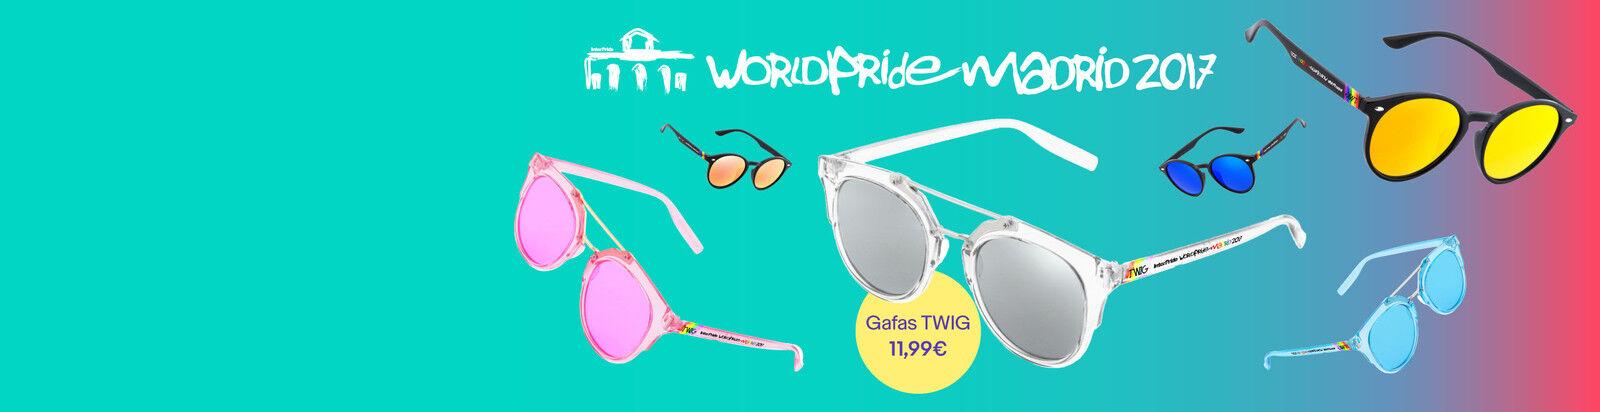 Elige tus gafas #eBayforDiversity y colabora con It Gets Better